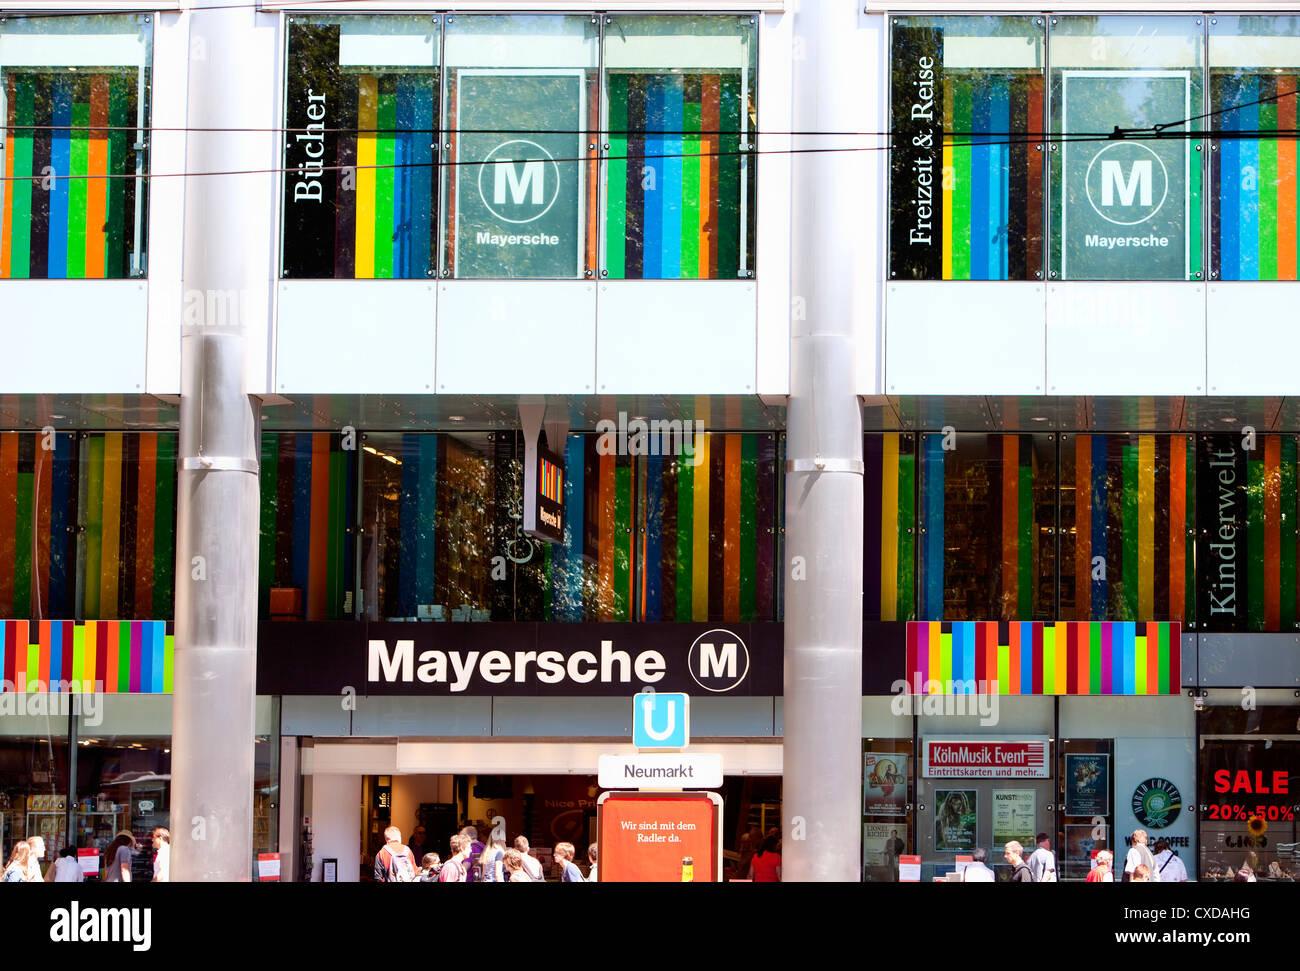 Bookstore in Cologne, Germany, Hausfassade, Mayersche Buchhandlung am Neumarkt, Köln, Nordrhein-Westfalen, - Stock Image